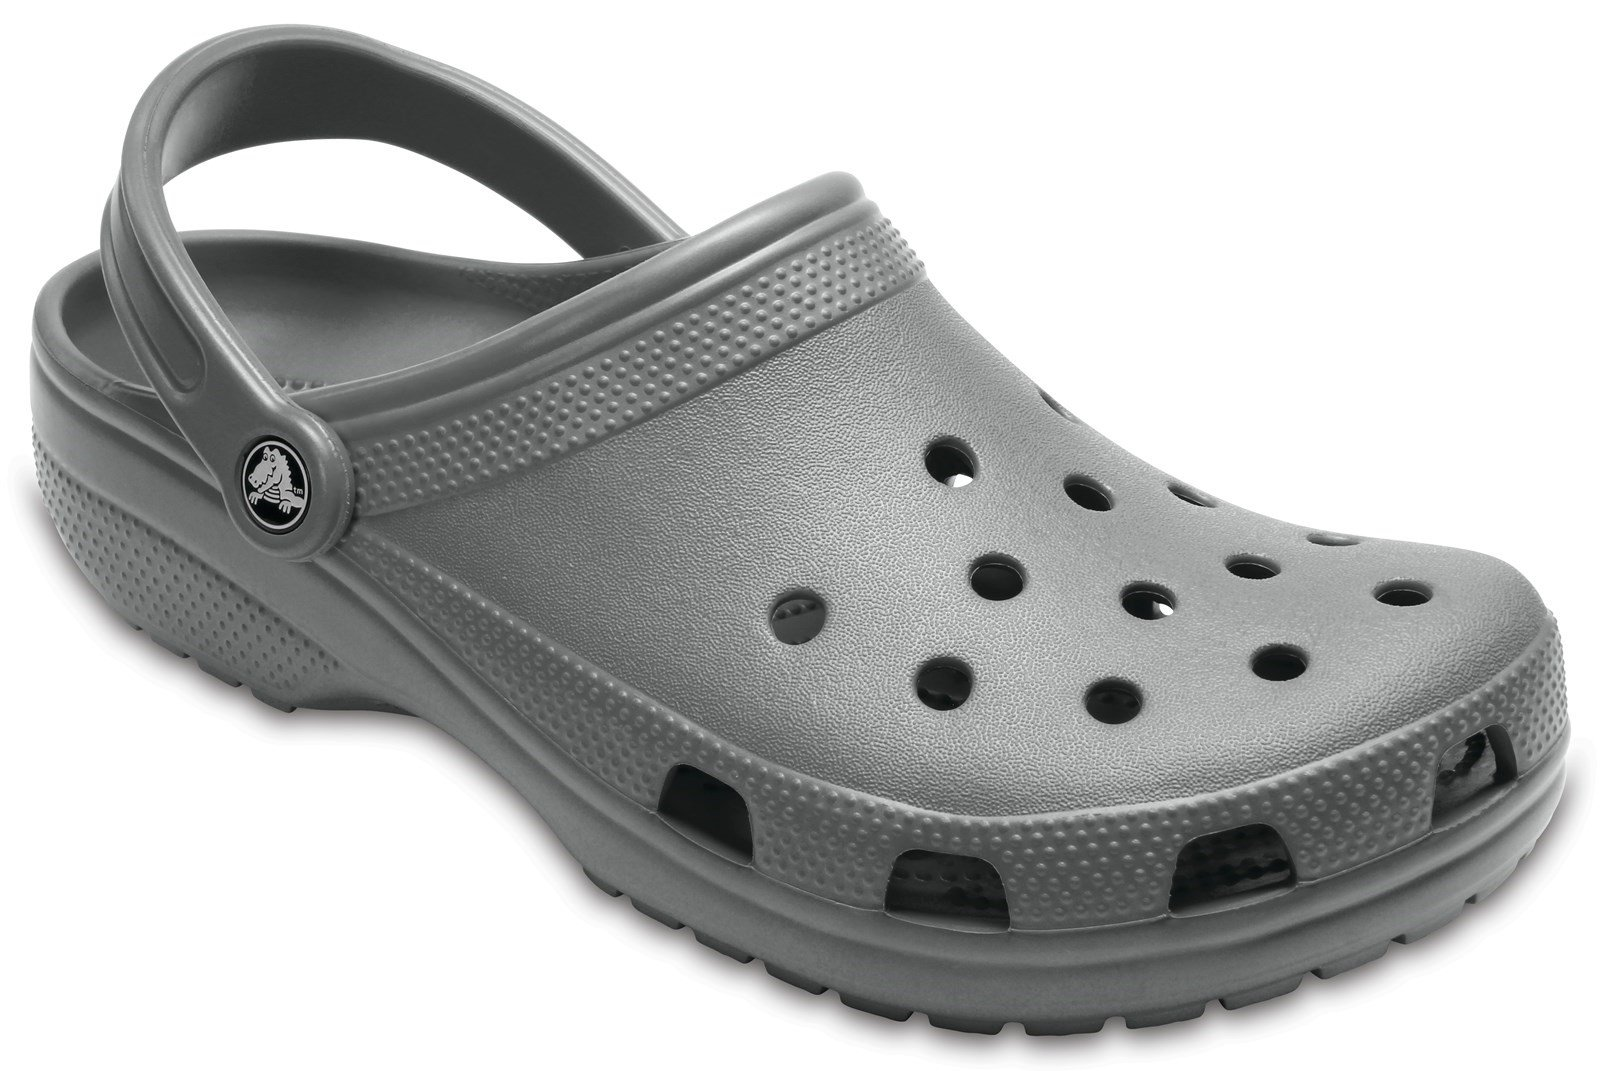 Crocs Unisex Classic Clog Sandal Various Colours 21060 - Slate Grey 8